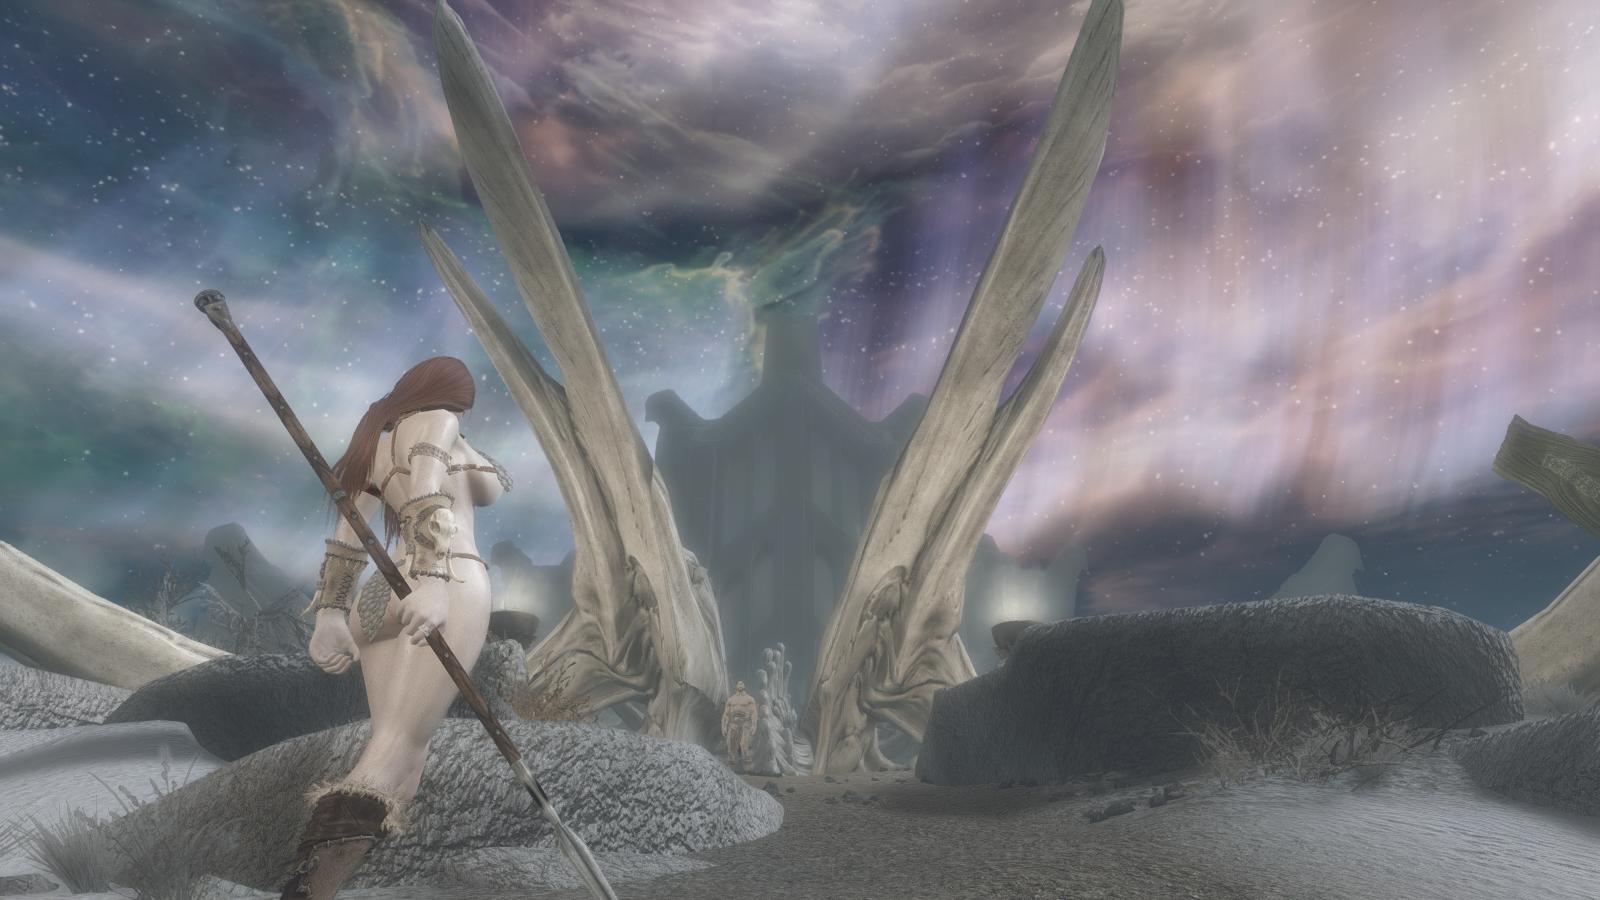 enb 2021_05_17 18_54_47_54.png - The Elder Scrolls 5: Skyrim